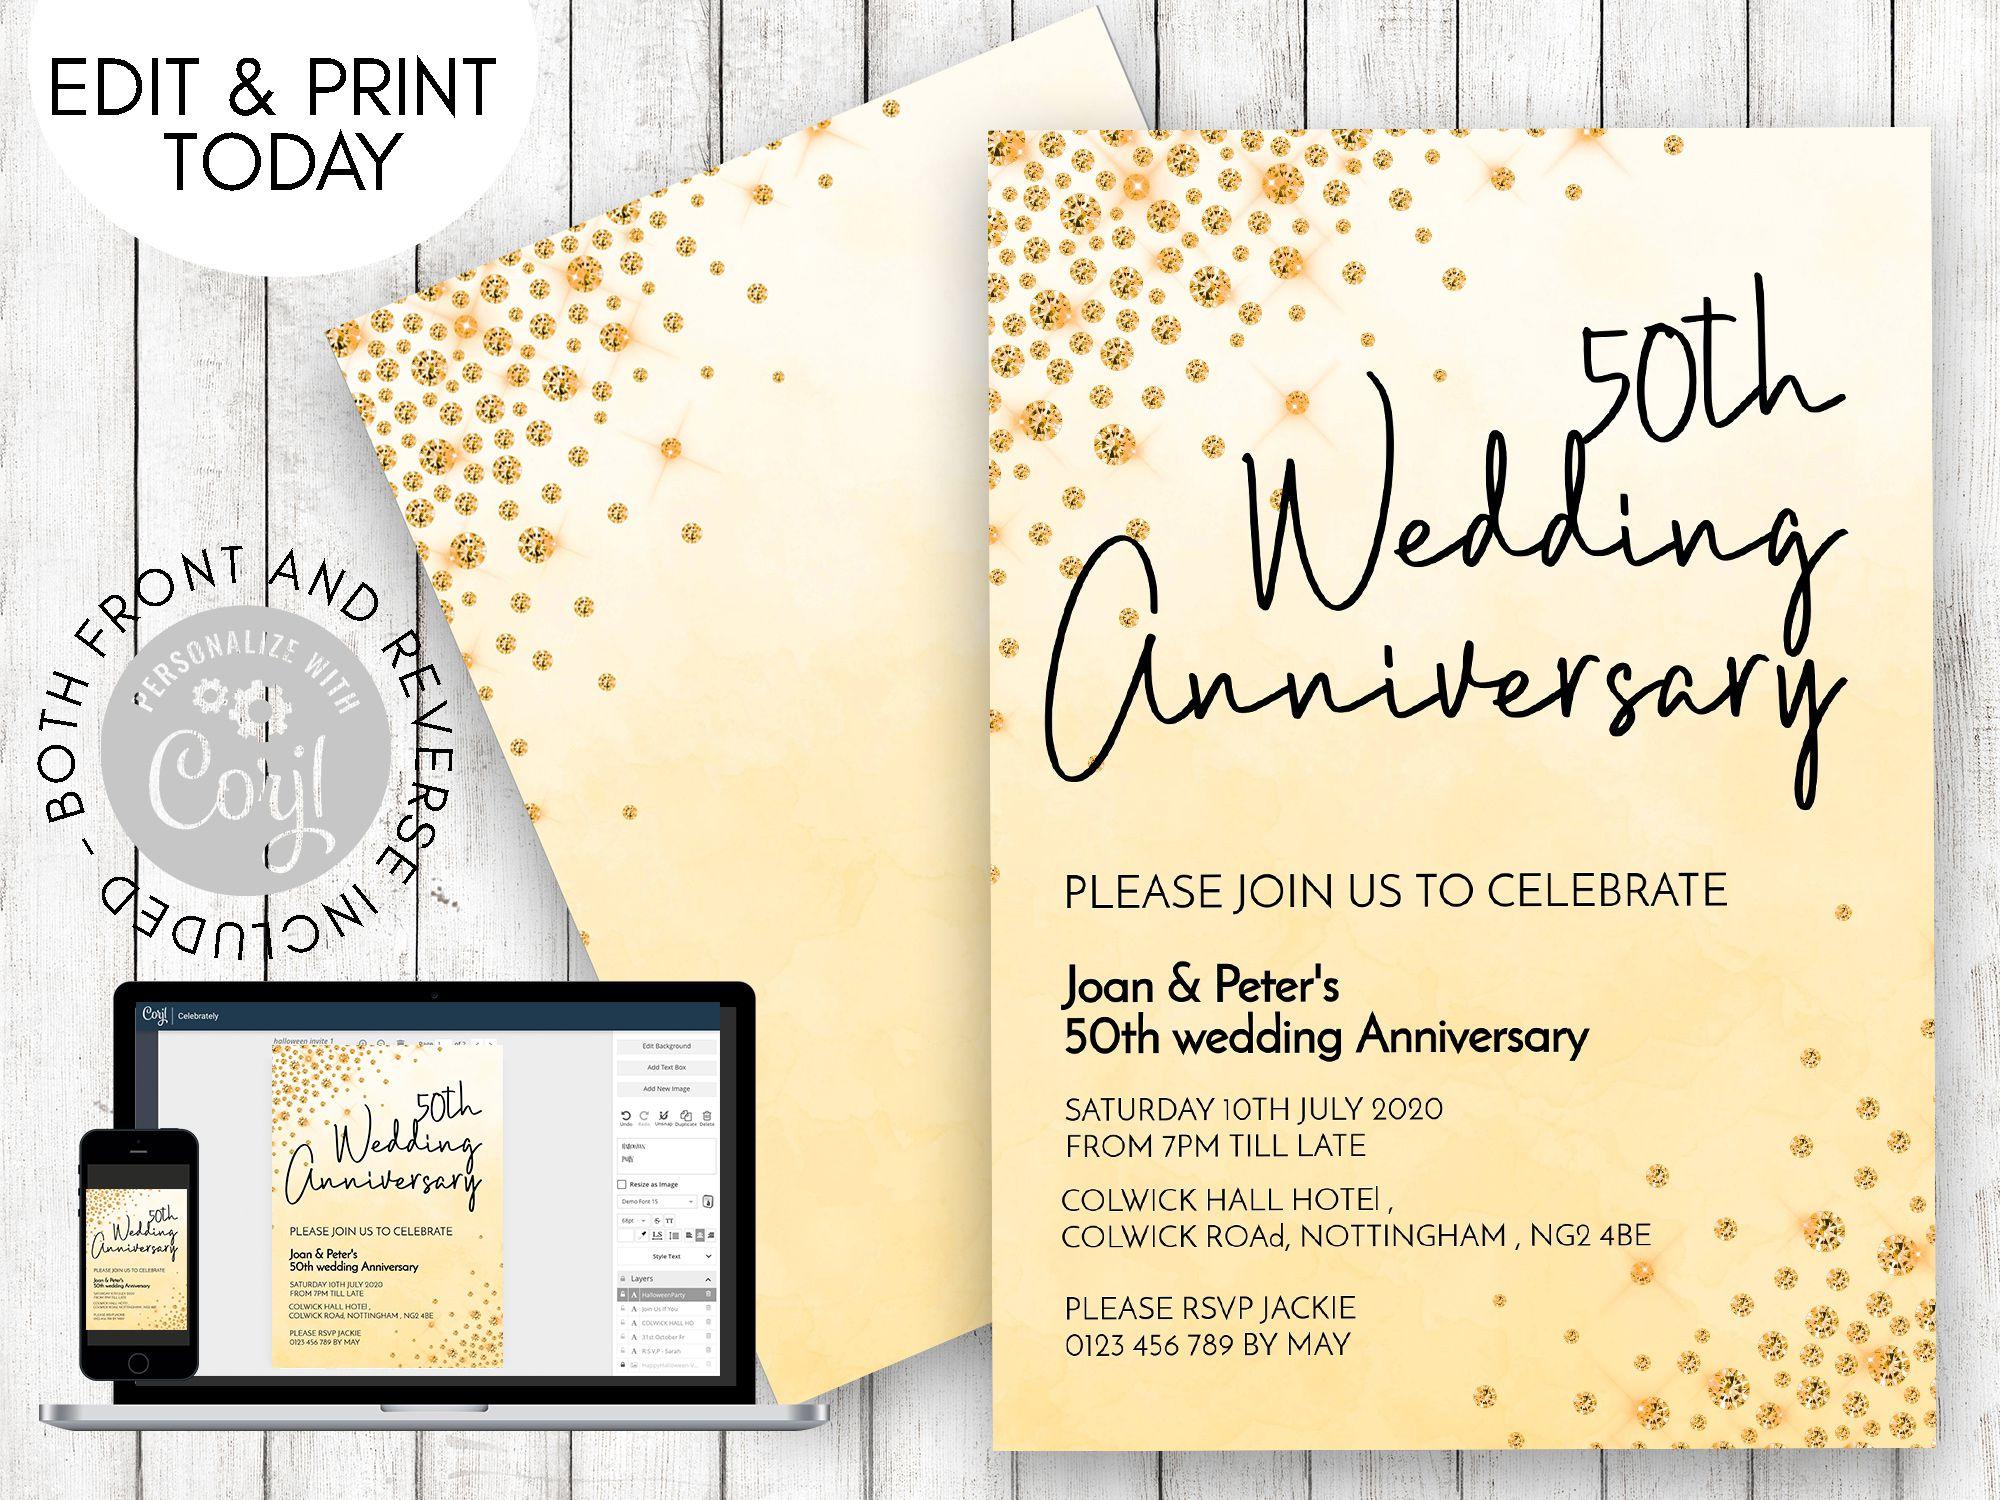 003 Wondrou Free Printable 50th Wedding Anniversary Invitation Template Photo Full